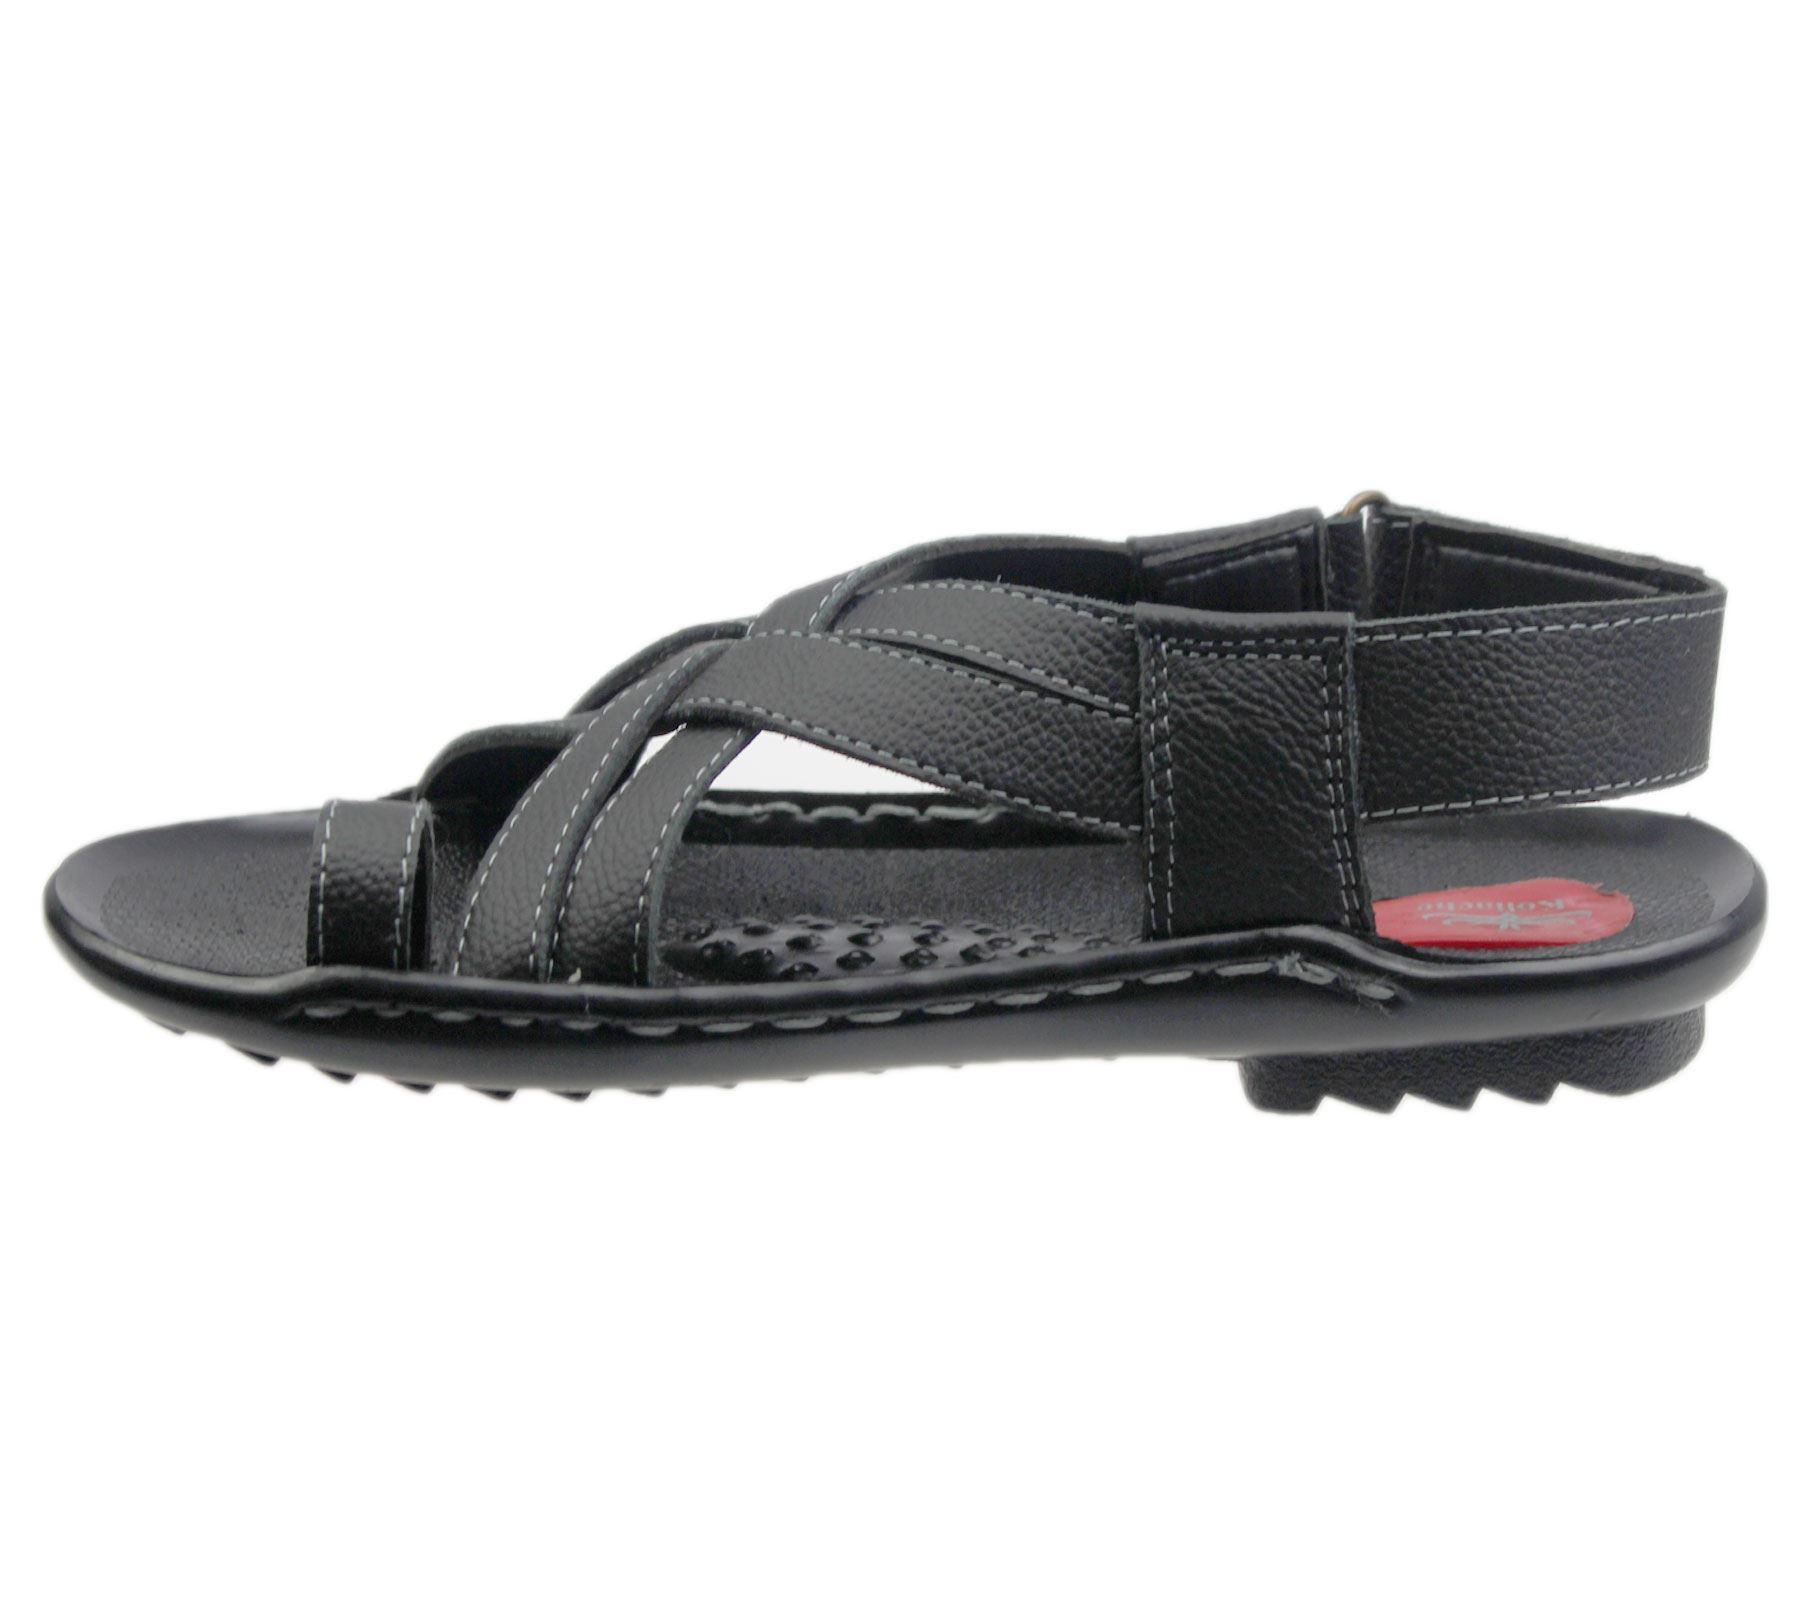 Mens Flat Sandal Casual Beach Walking Fashion Leather Slipper Flip Flop Size